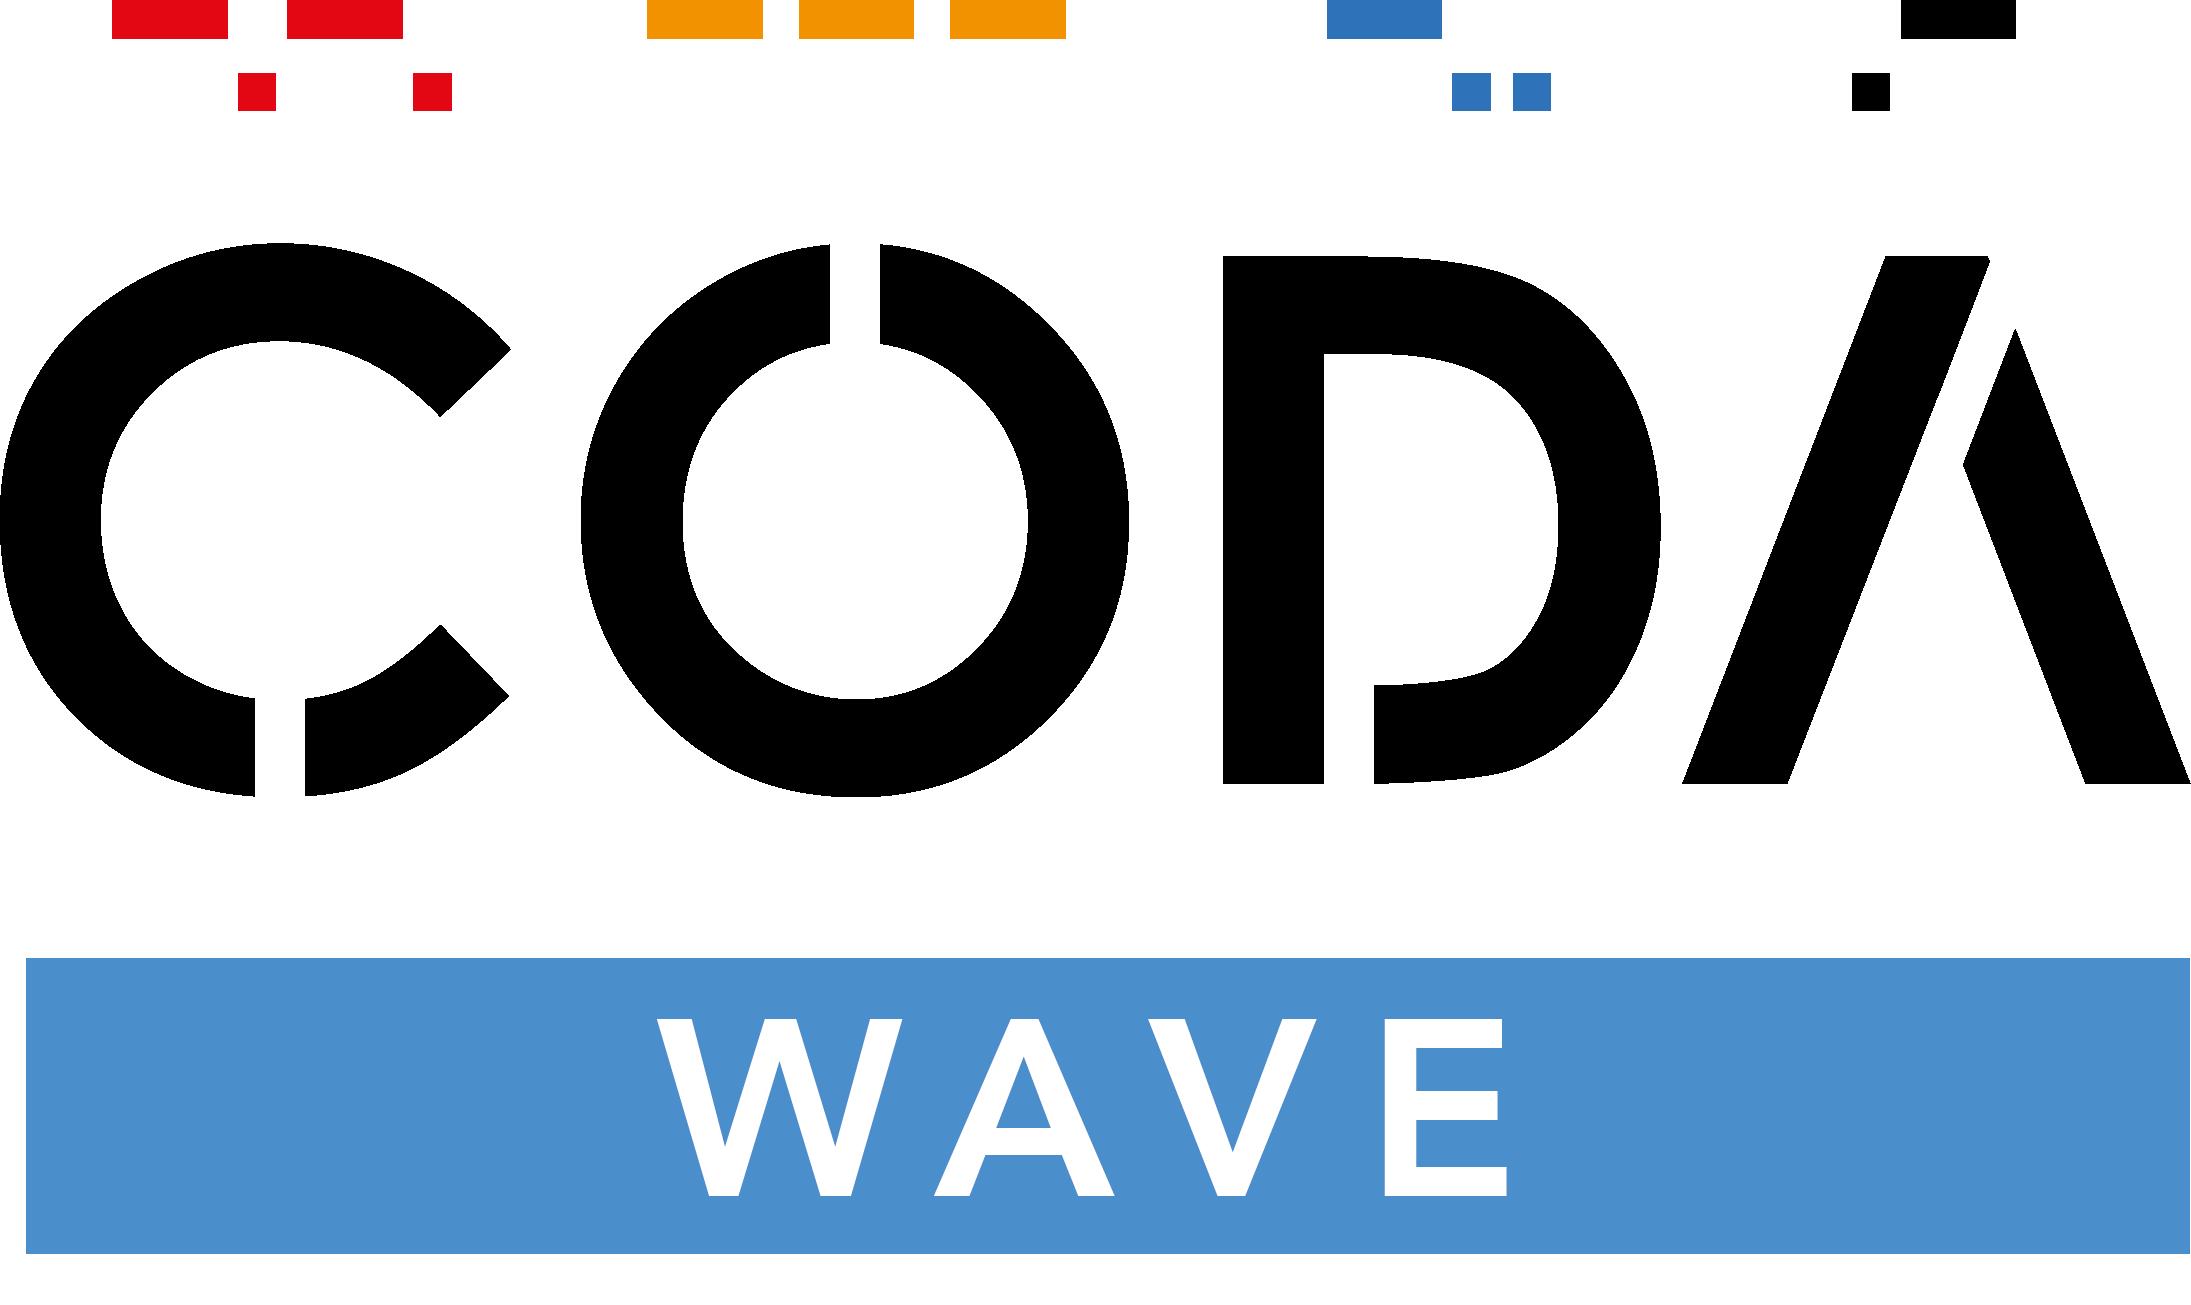 CODA_WAVE_11_INCH_WINDOWS_10_CONVERTIBLE_LAPTOP